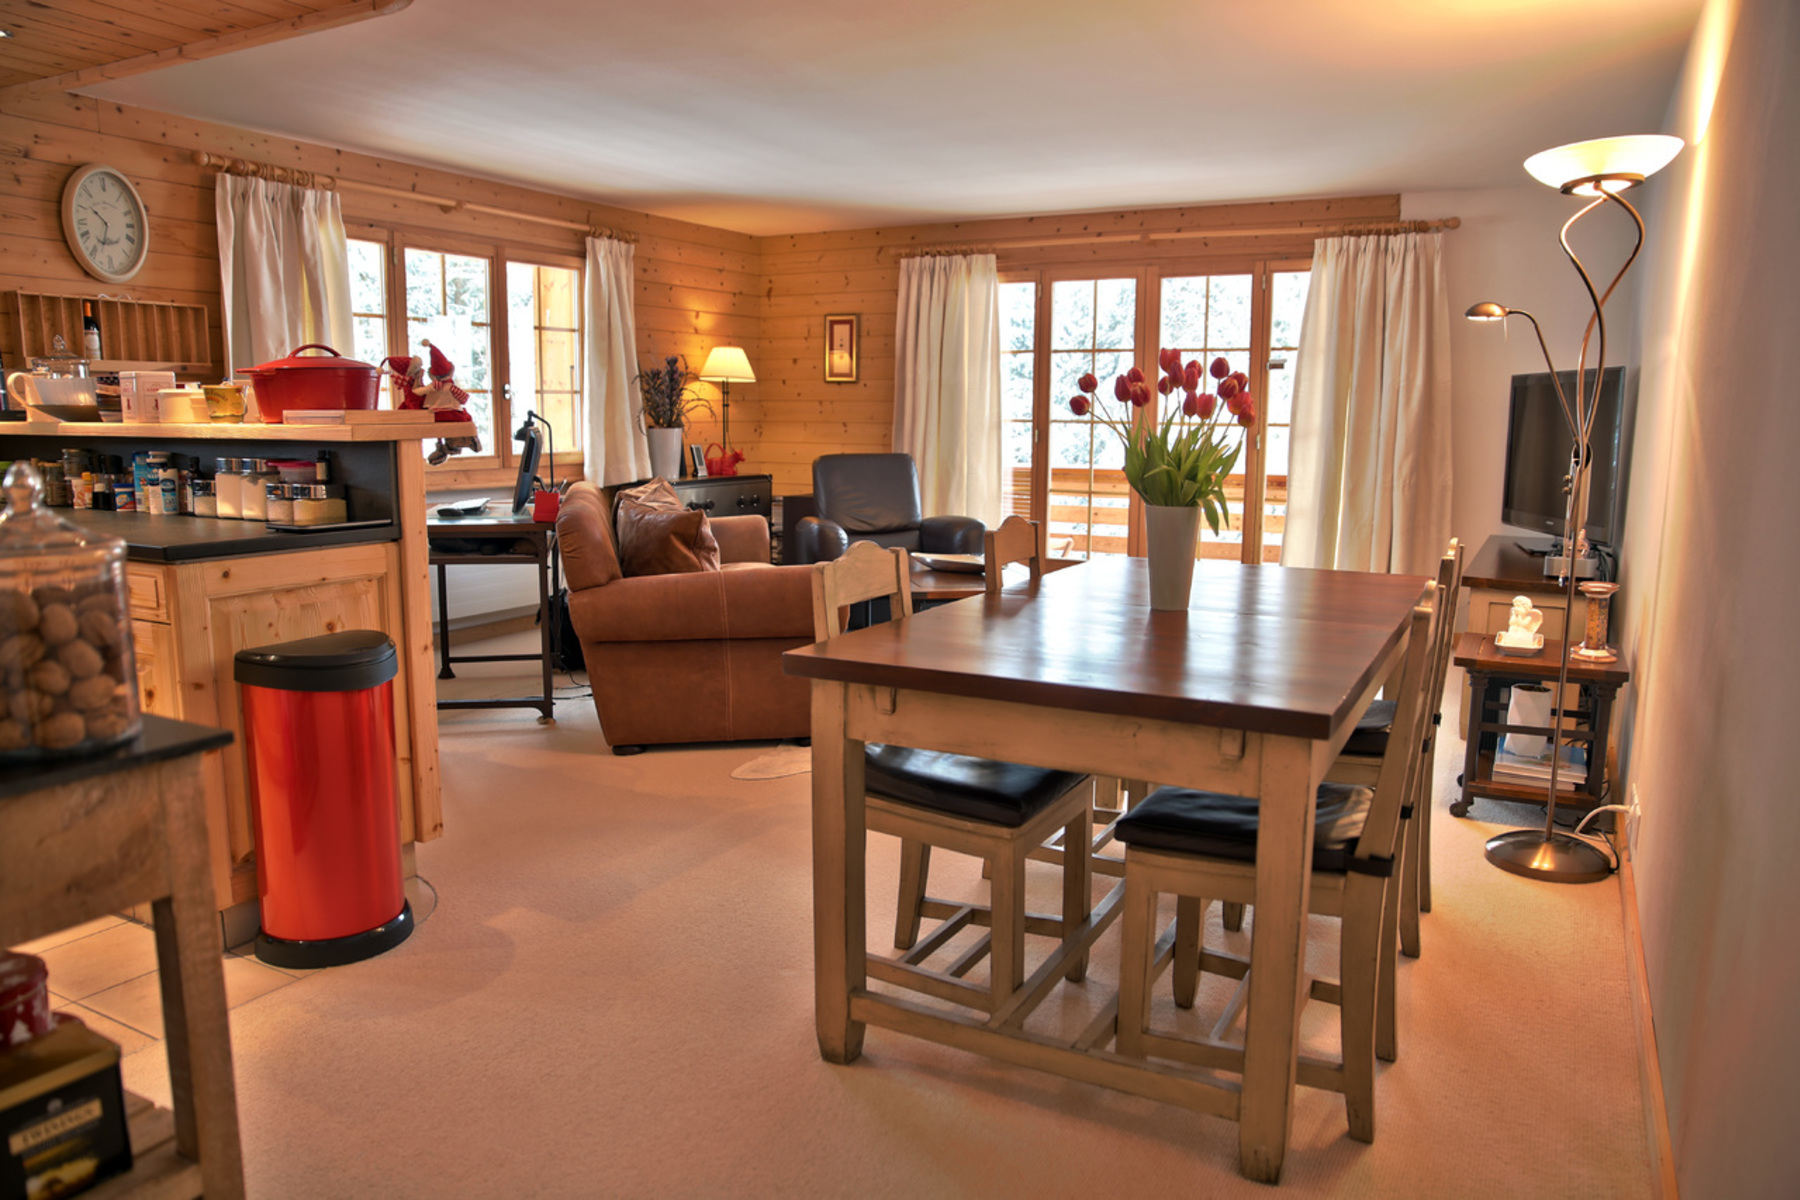 Condominium for Sale at Mandarin 5 Route de la Résidence 102 Villars-Sur-Ollon, Vaud, 1884 Switzerland